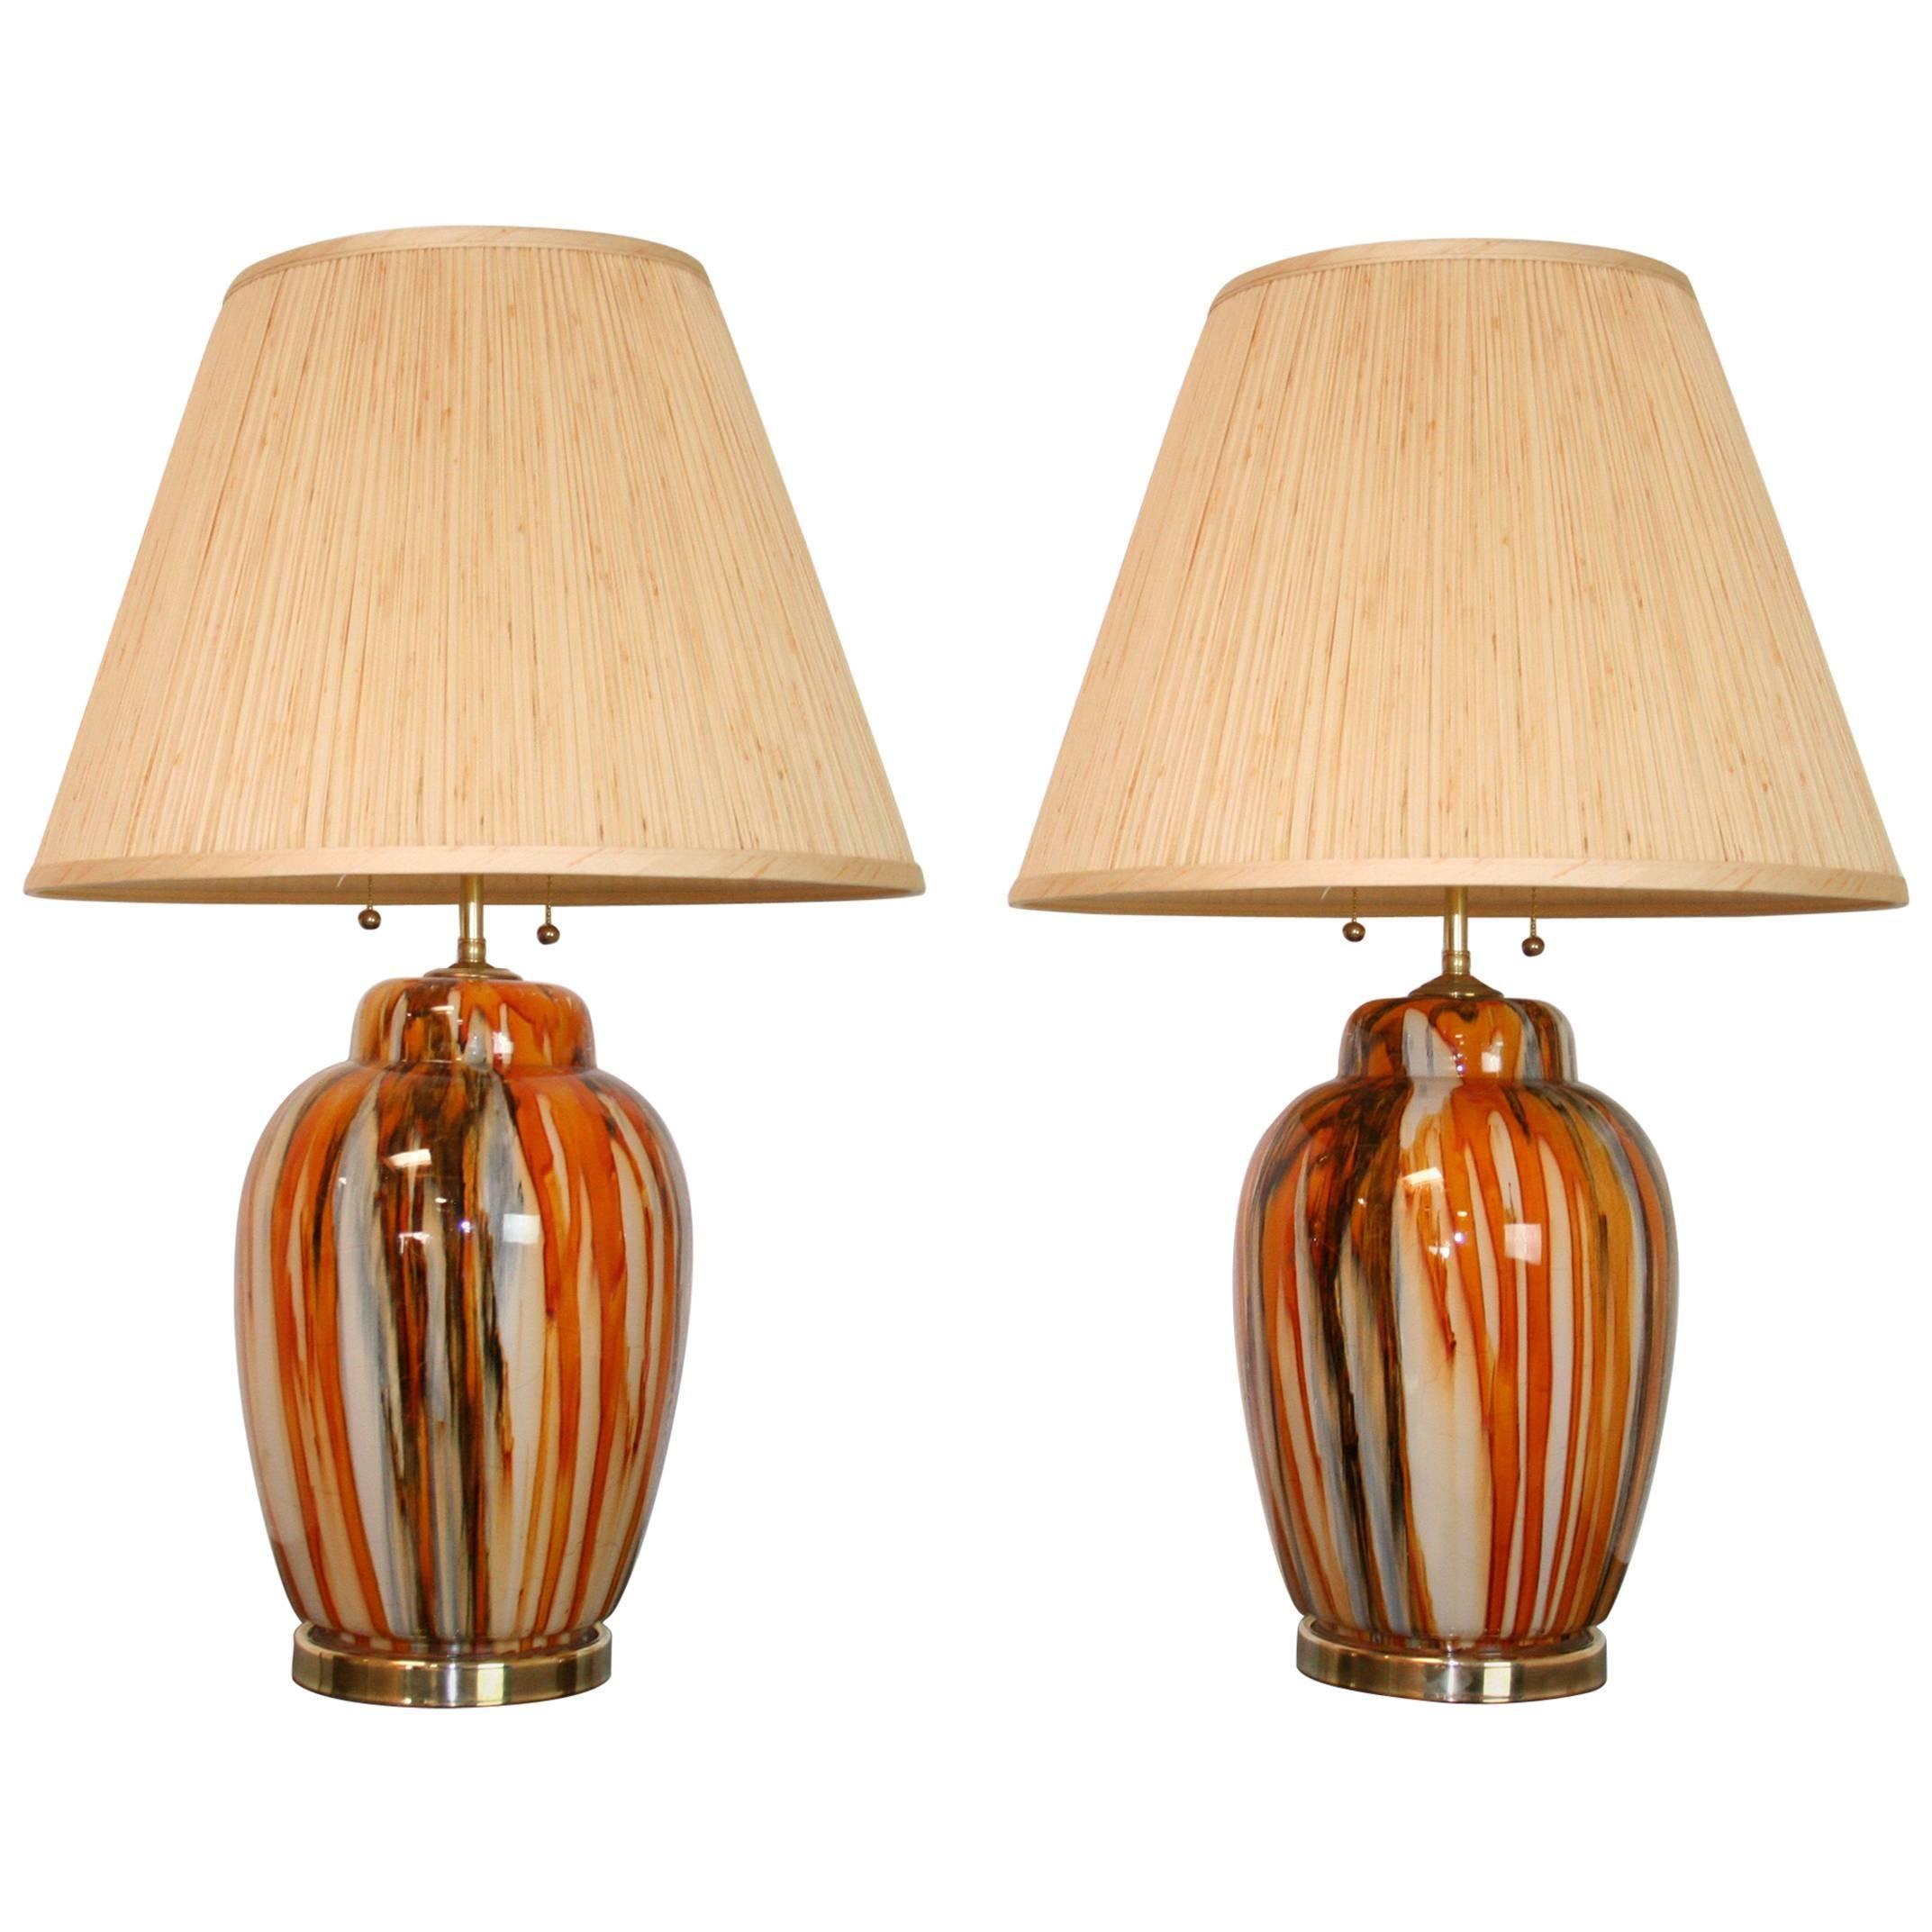 Pair of Italian Modern Glass Lamps